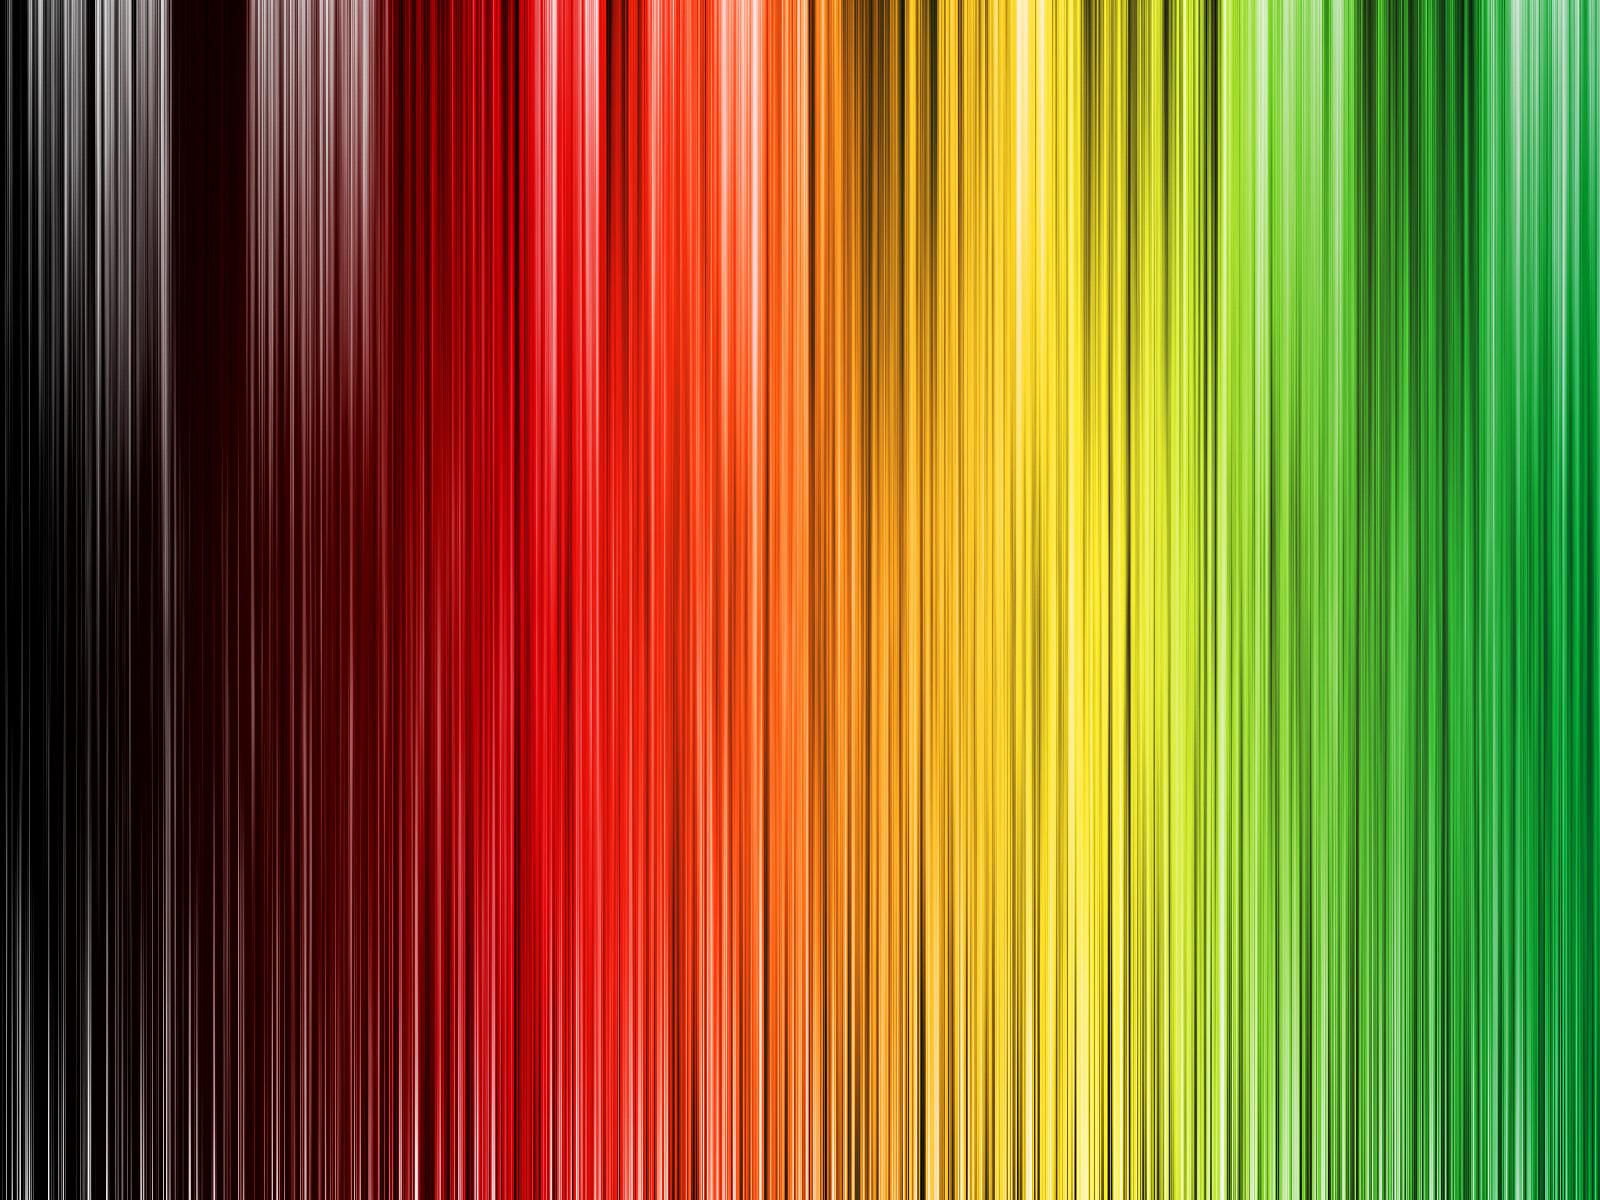 Rasta Wallpaper 7522 1600x1200 px HDWallSourcecom